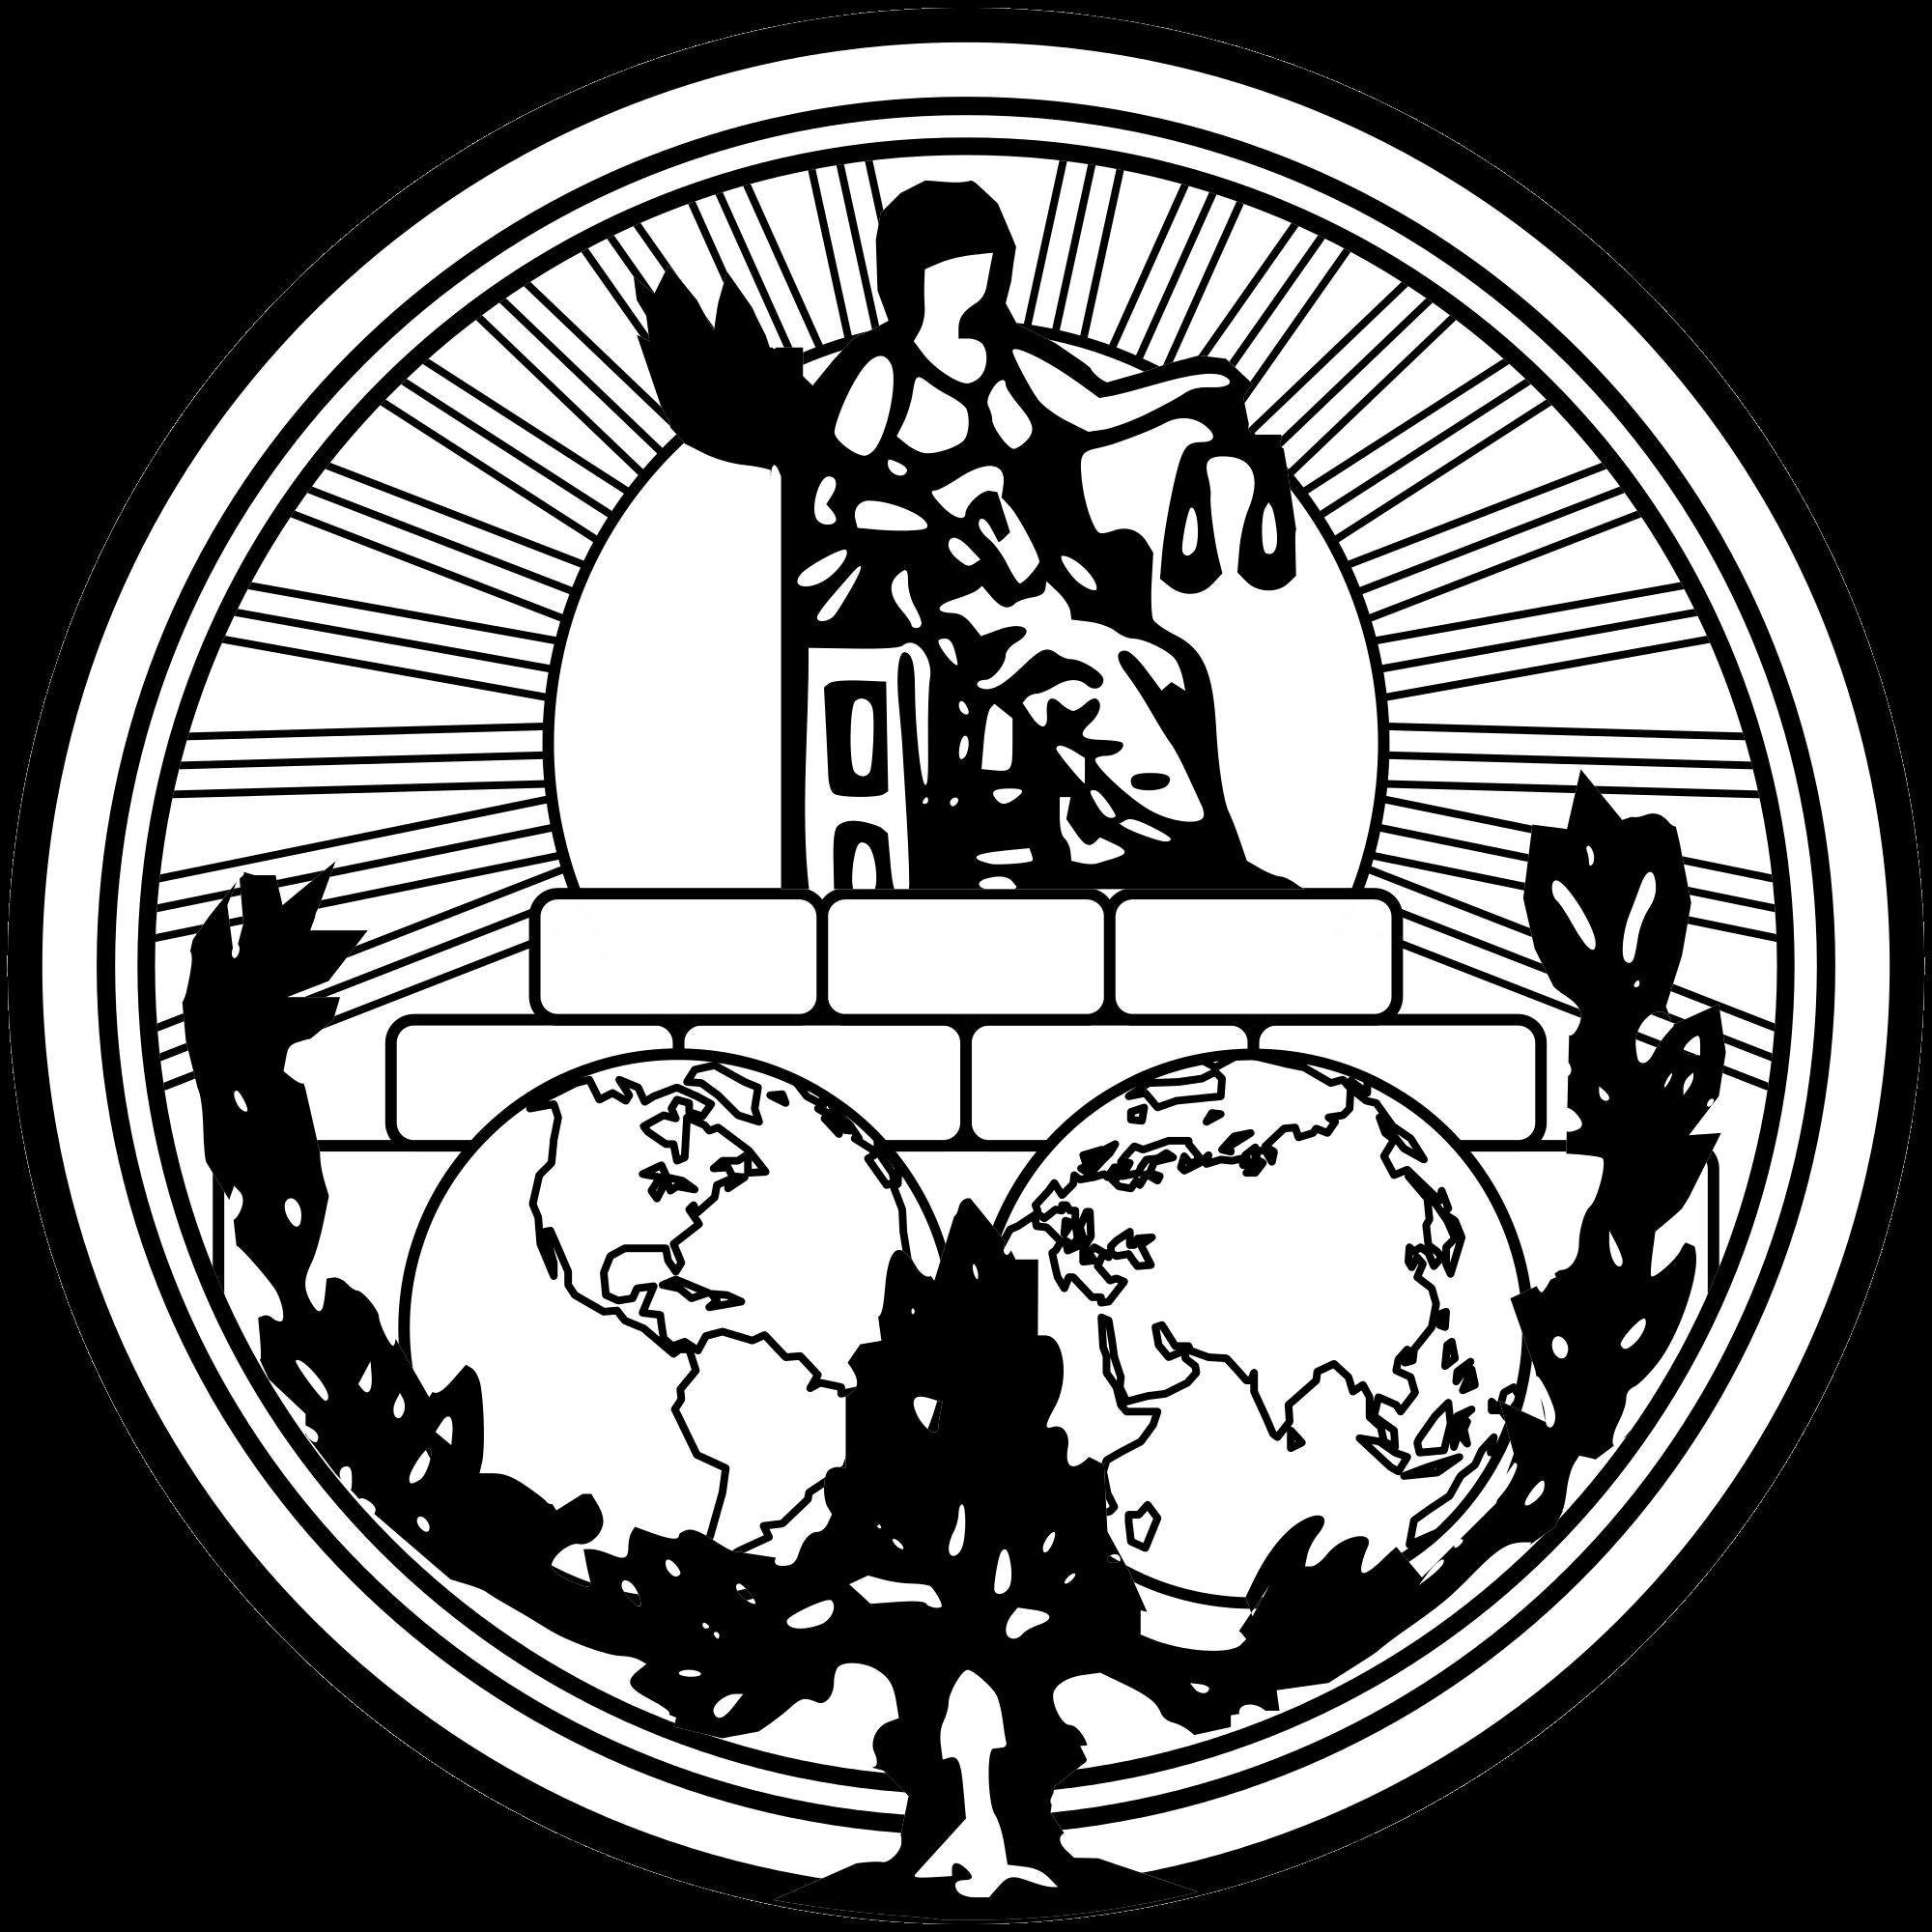 Resultado de imagen para international court of justice logo